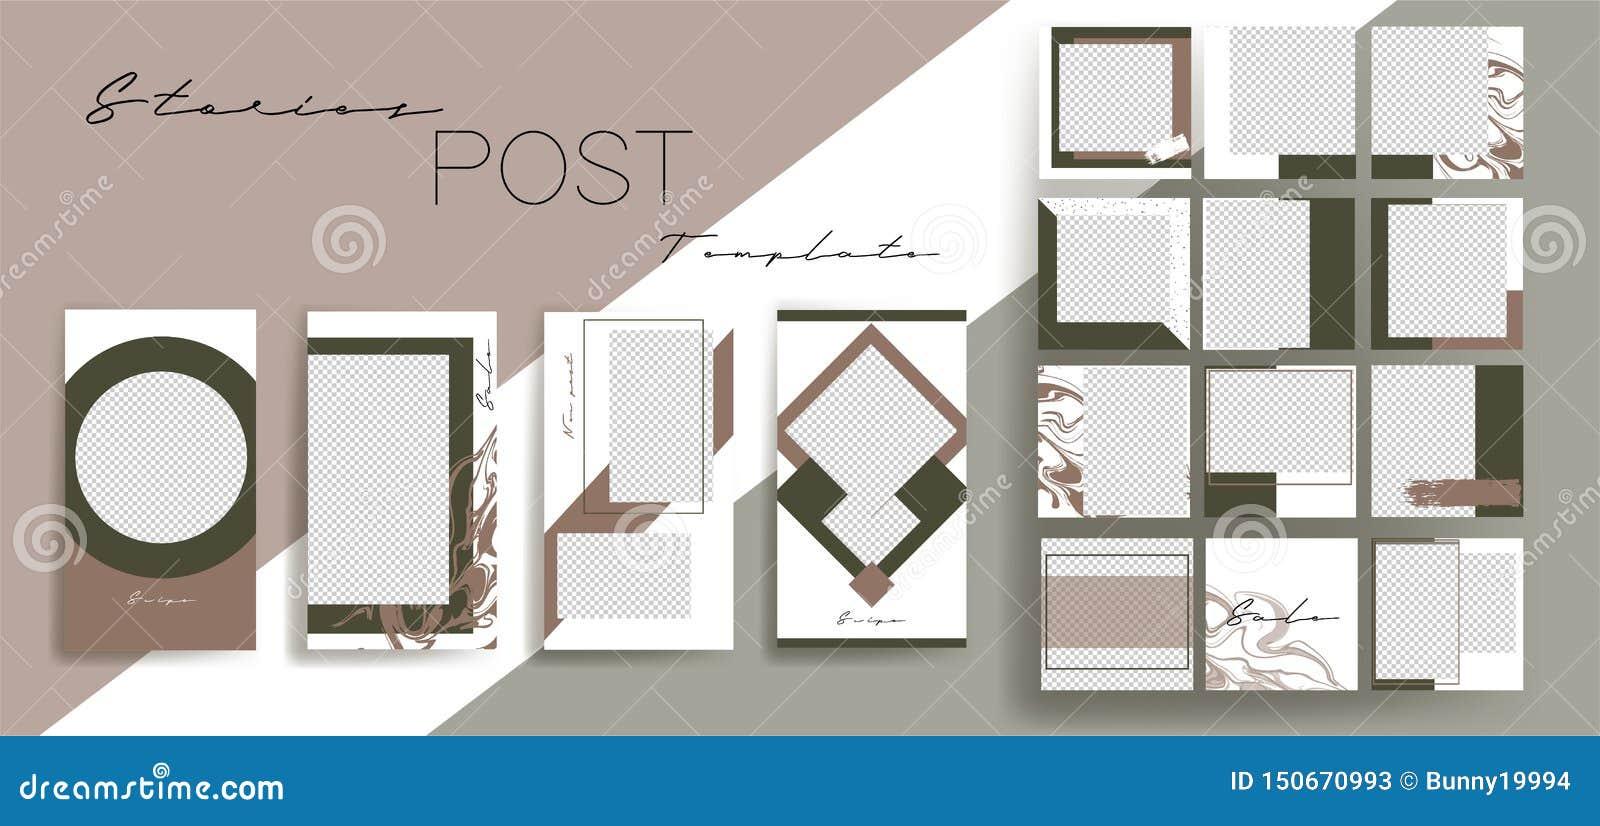 Design backgrounds for social media banner.Set of instagram stories and post frame templates.Vector cover.